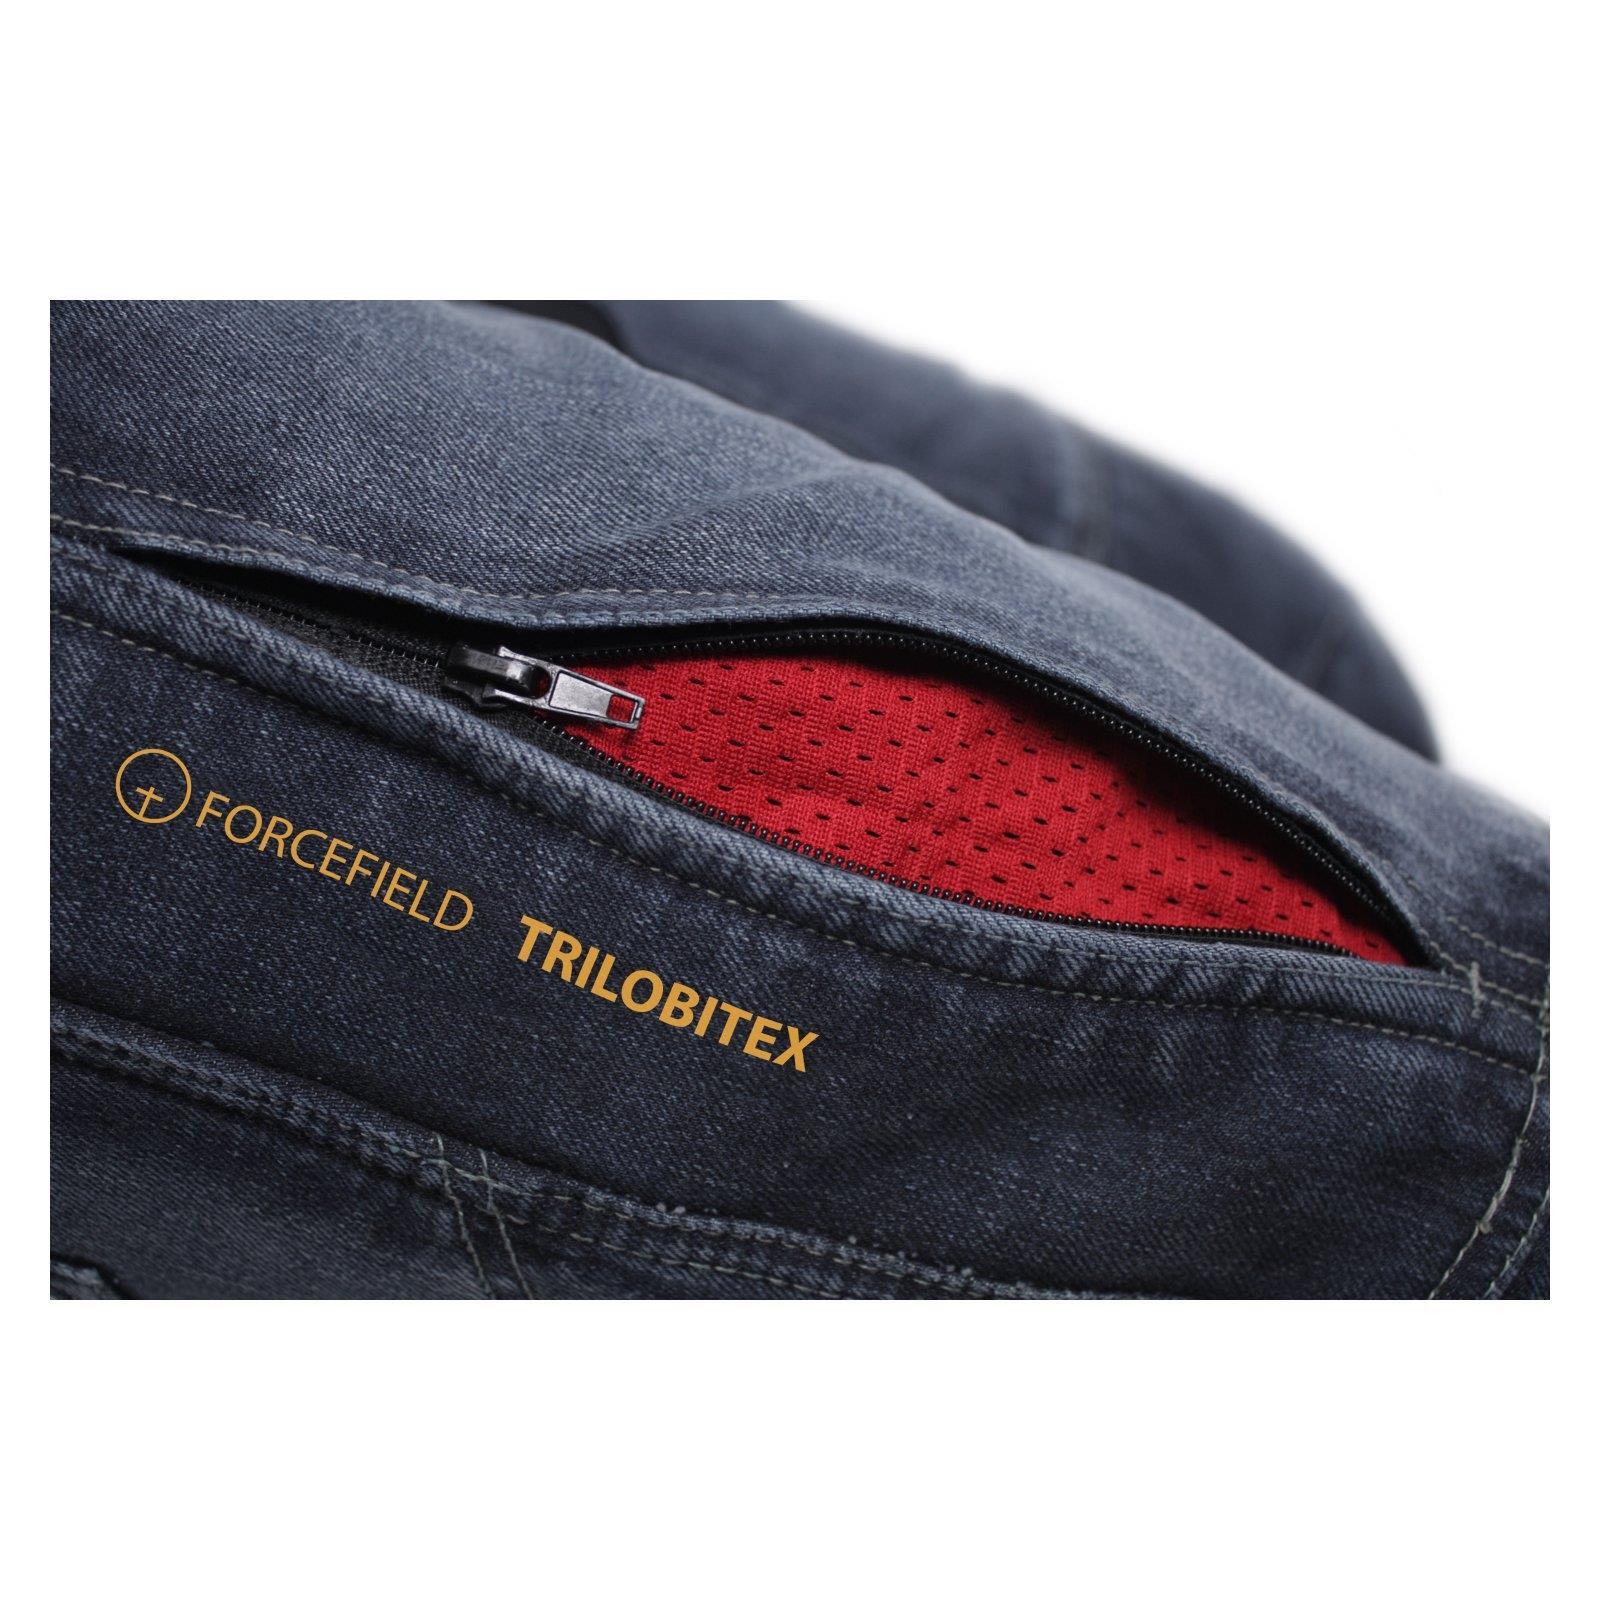 Trilobite-Pantaloni-Moto-Jeans-Abbigliamento-Parado-MICAS-URBAN-DUAL-PANTS-ACID miniatura 80